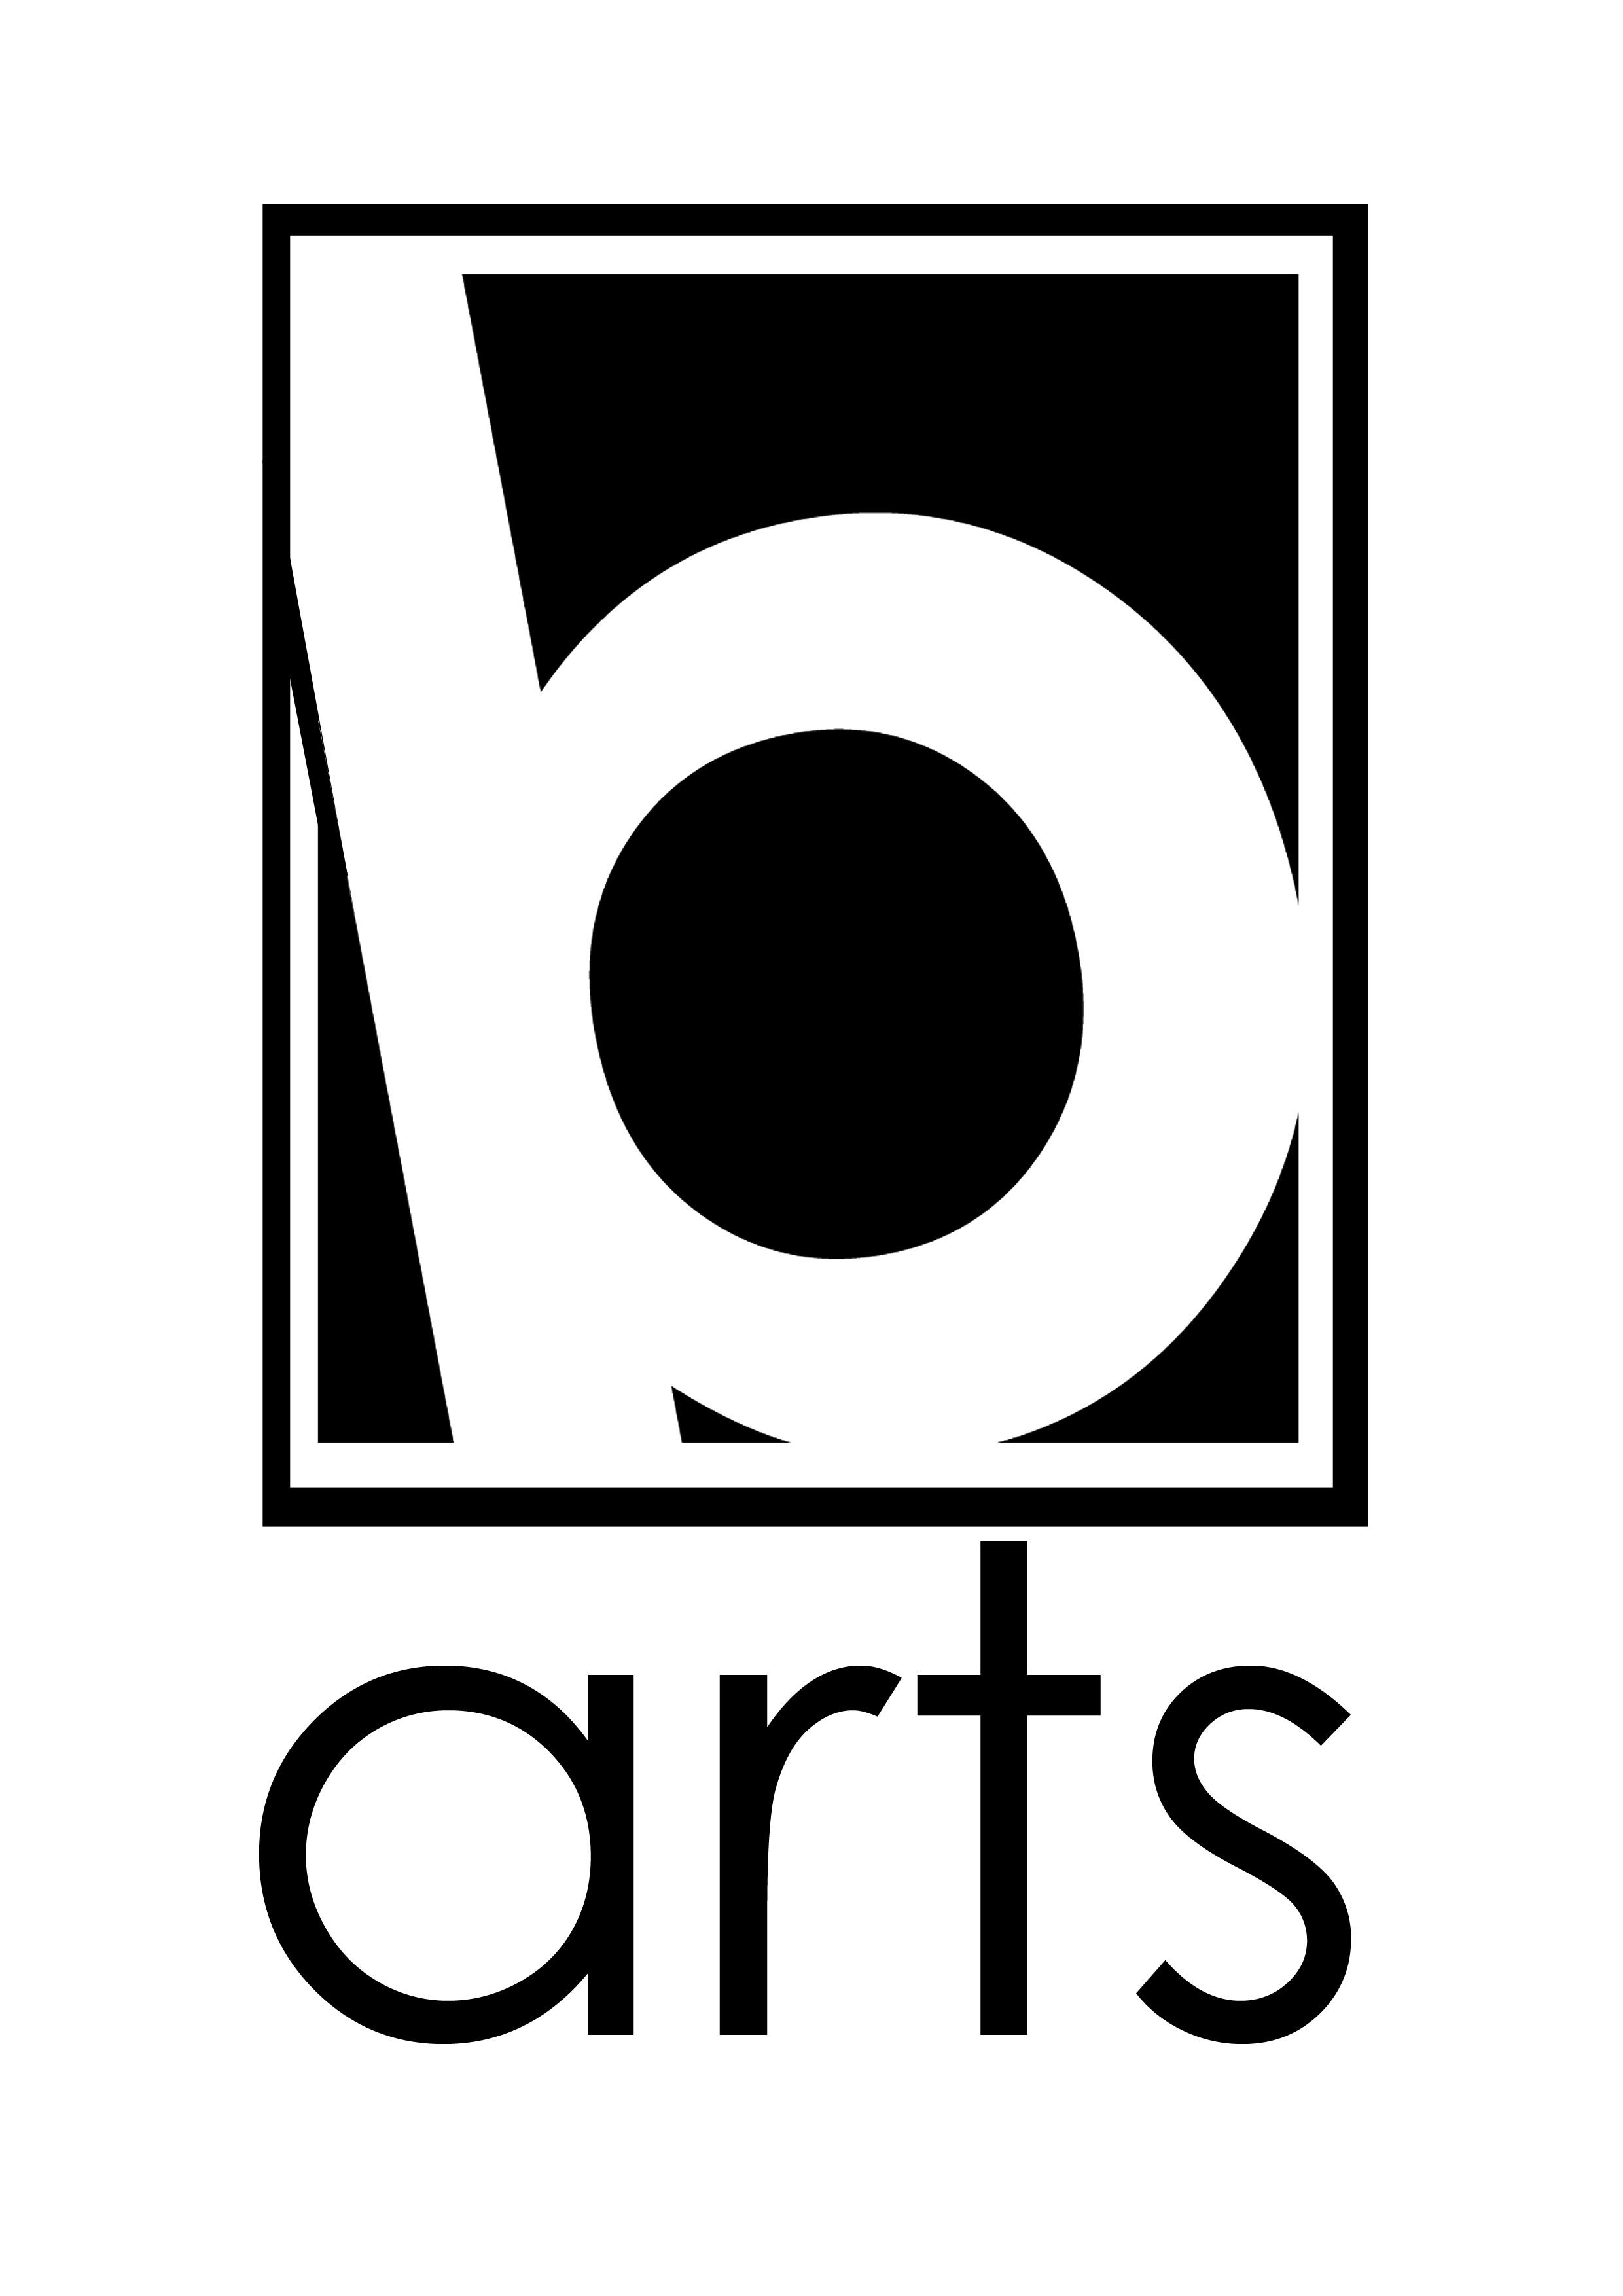 Film Screening: B Arts / Keele University